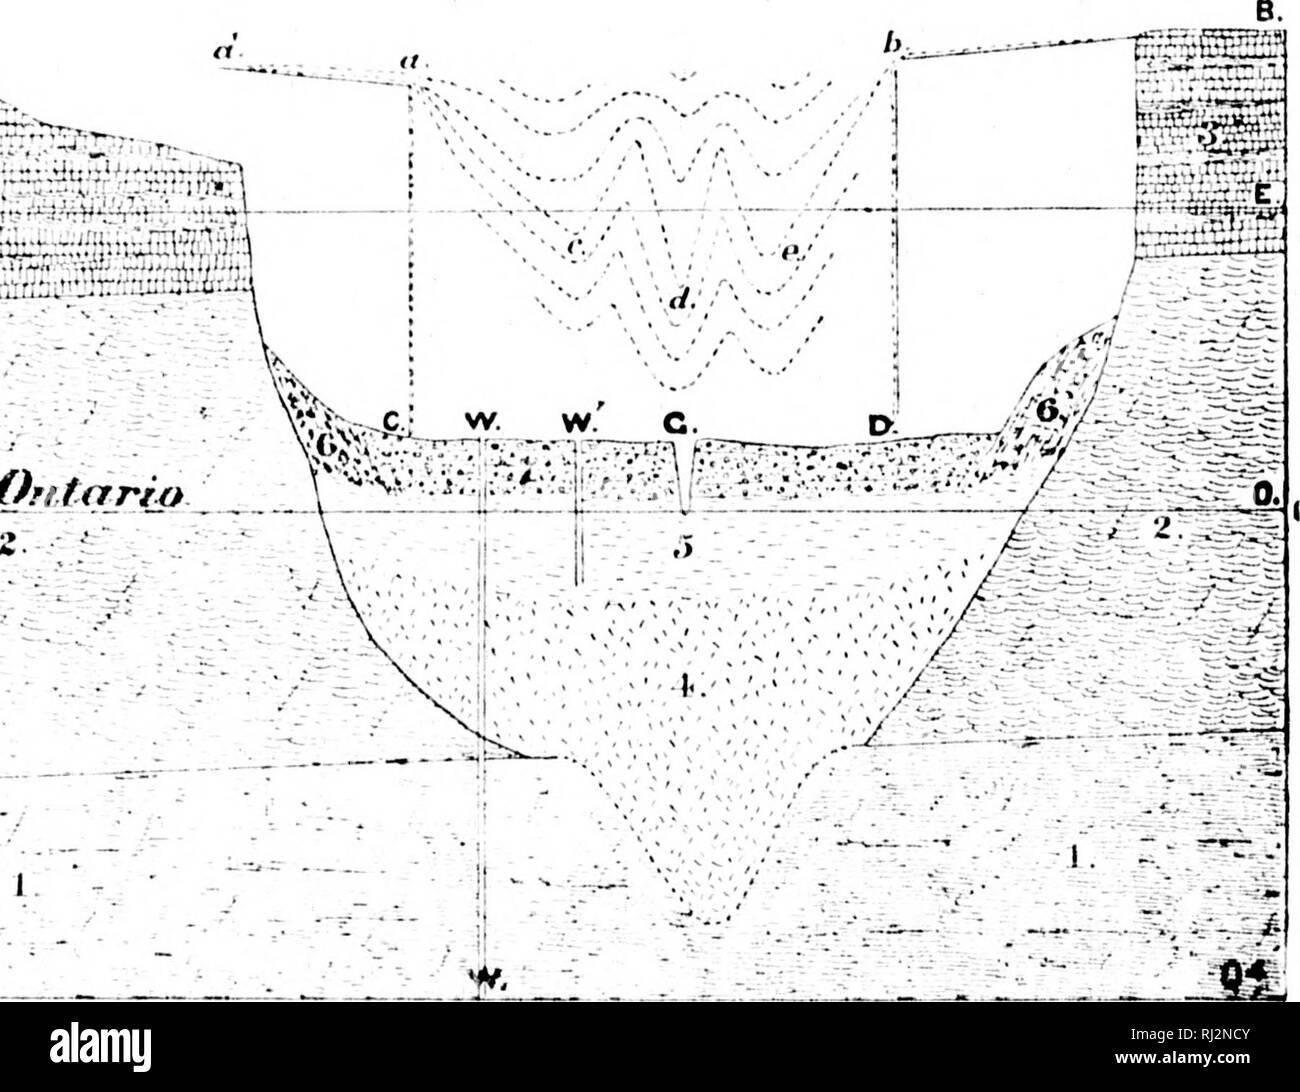 ". Palaeozoic geology of the region about the western end of Lake Ontario [microform]. Geology; Paleontology; Géologie; Paléontologie. oMj^ L_. I'Mu.'Jâ1. Iliulsdn Iiivfv tnrniiitioii : 2. Medina slialcs ; :!. Niagara .UKl 'Mintoii (Inlumitt's with sonte siiaifs. A, ('. D, 1'.. modern valley at ini'iidiai) ol ]>urliii,i;h>ii iiei^hts: r, (', D. li, modern valley at meri- dian of I)iiiiilas: a, c, d. e, li, sertions across, deeply excavated in beds ol' streams in wistein part of the Dundas valley ; â¢!. i'.onkler clay liilinn'aiK ient viiliey : ,""). Erie clay: C. 'I'lilns from side - Stock Image"